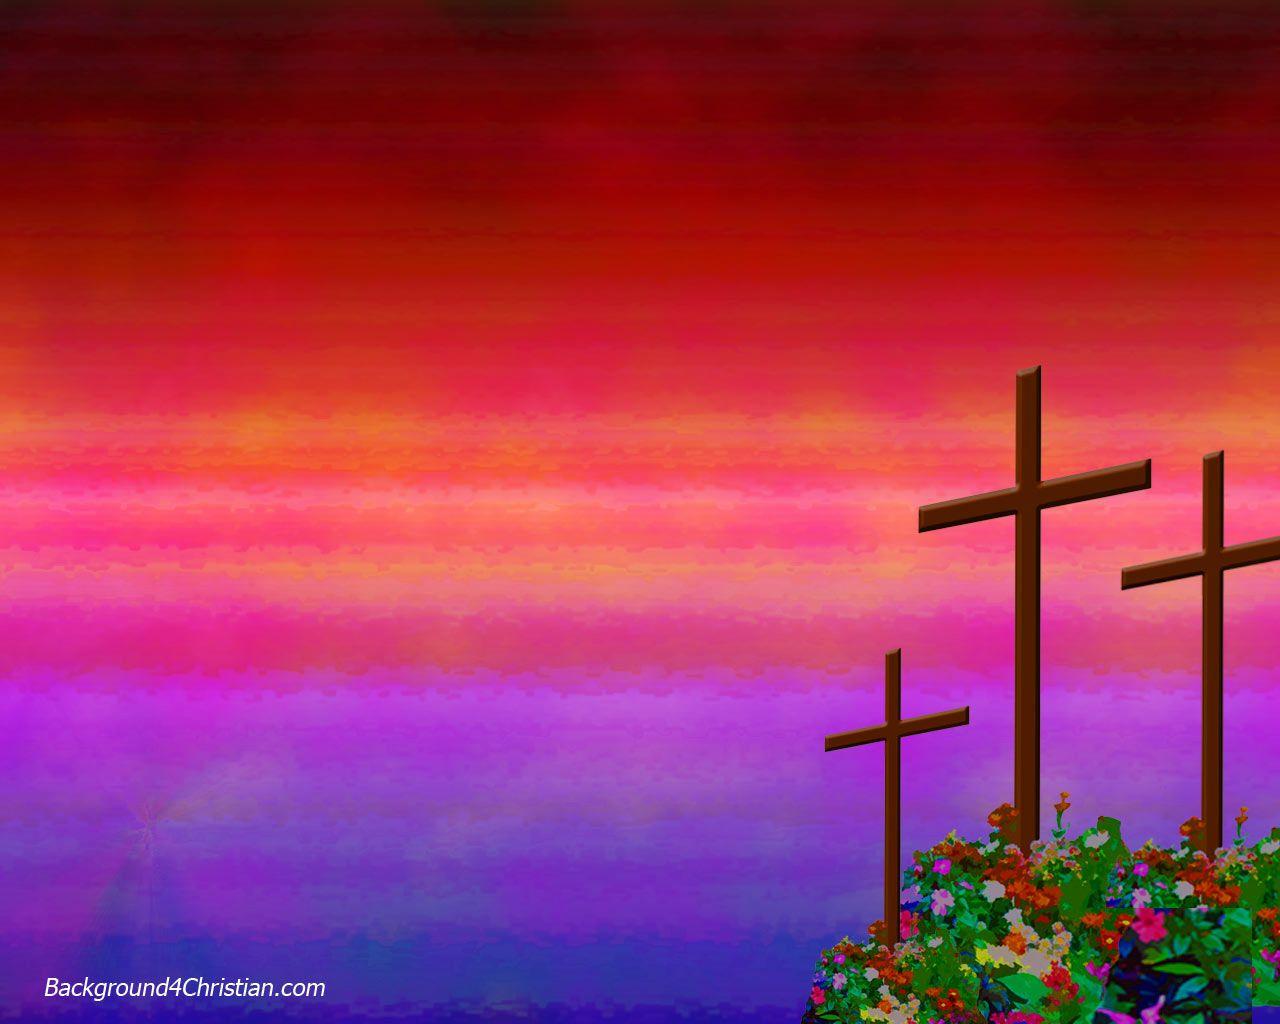 Google chrome themes jesus christ - Easter Theme Background 4 Christian